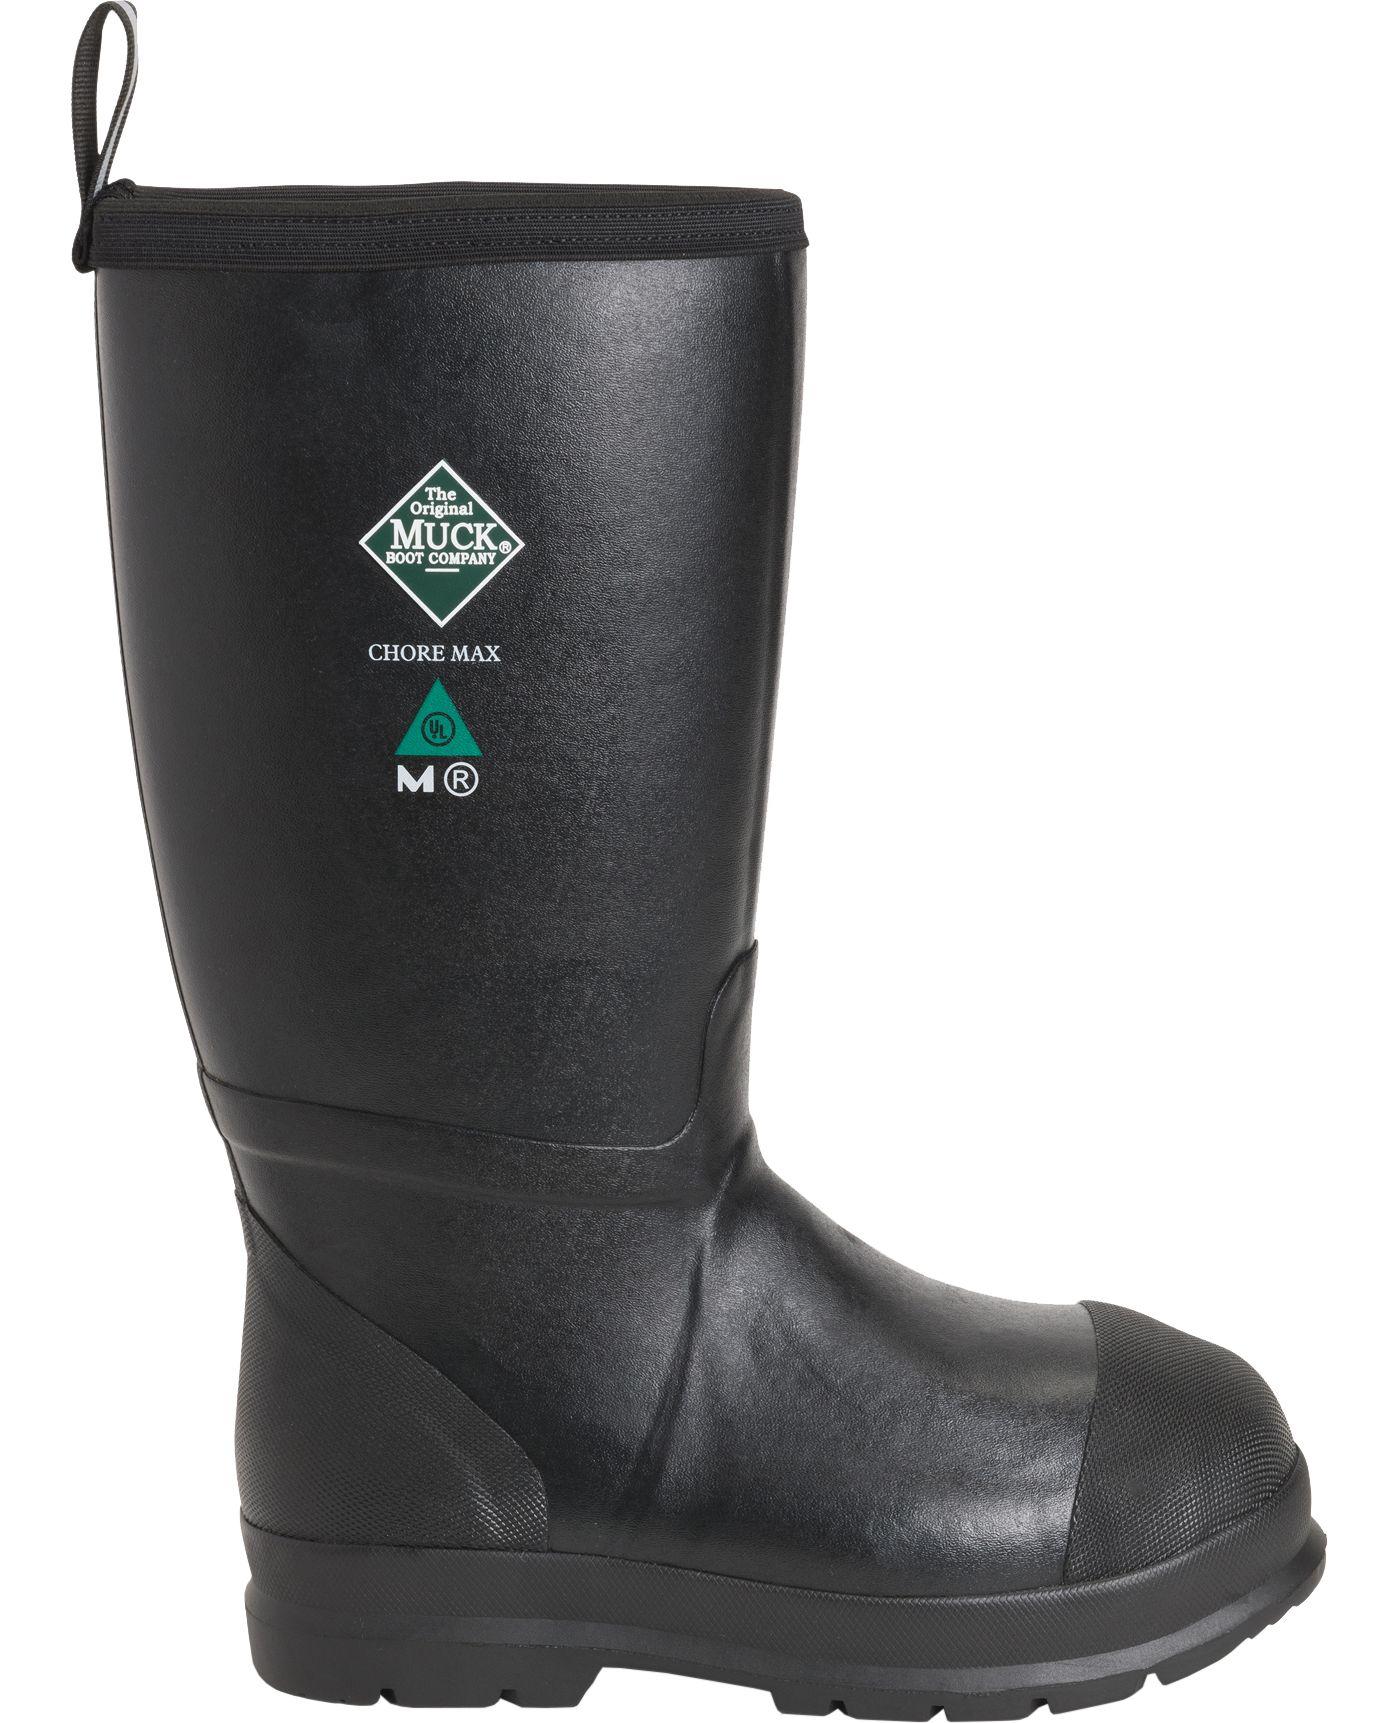 Muck Boots Men's Chore Max Resistant Waterproof Composite Toe Work Boots